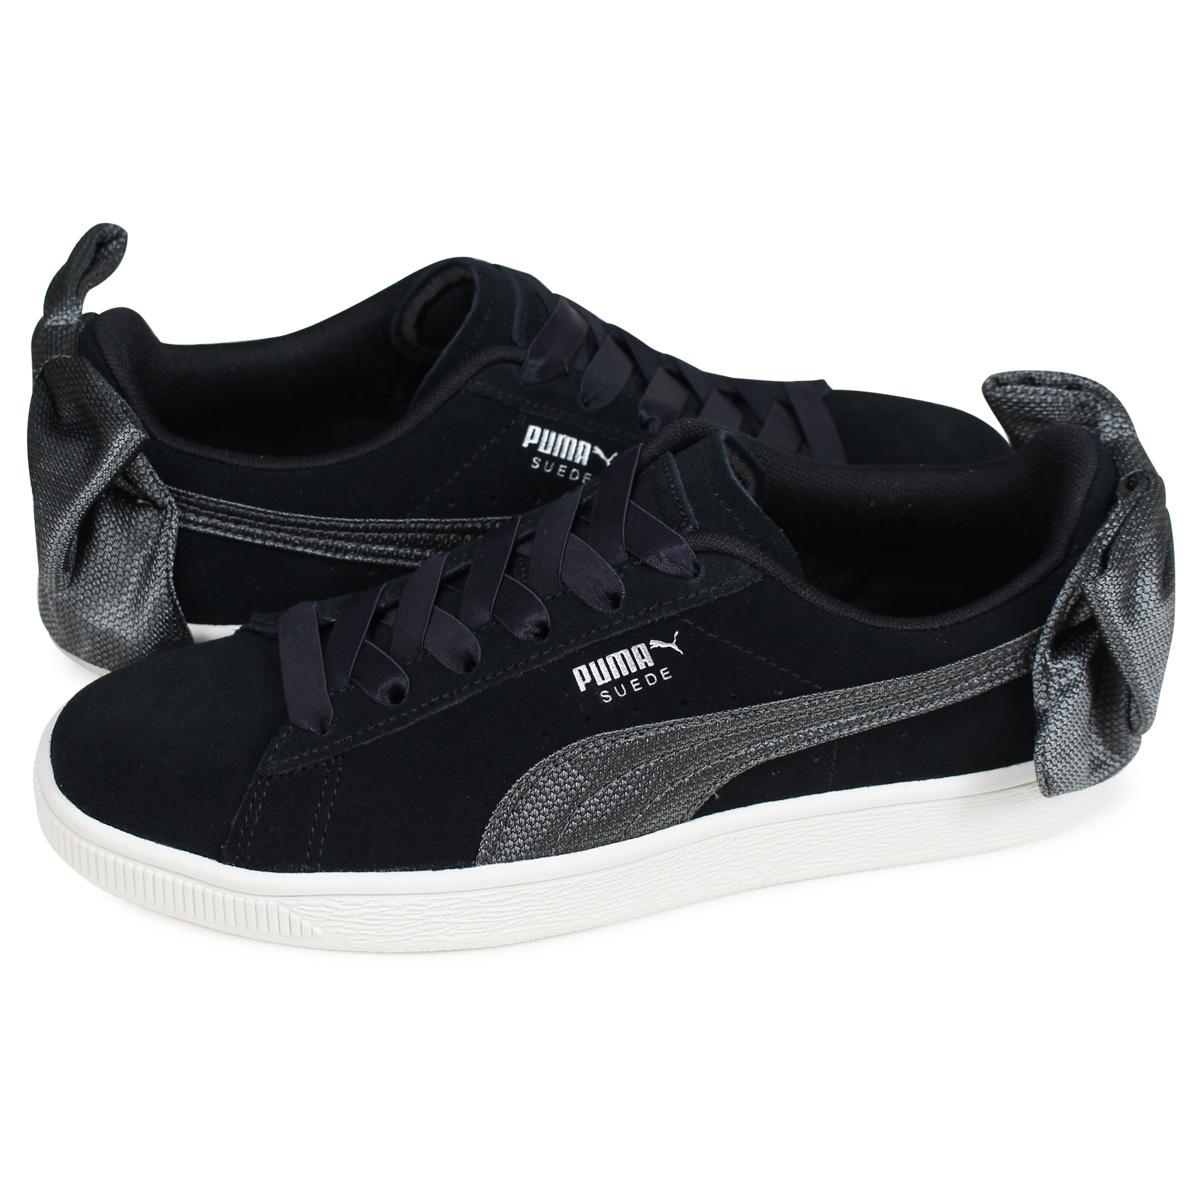 PUMA WMNS SUEDE BOW HEXAMESH Puma suede bow tie sneakers Lady's black black 36915104